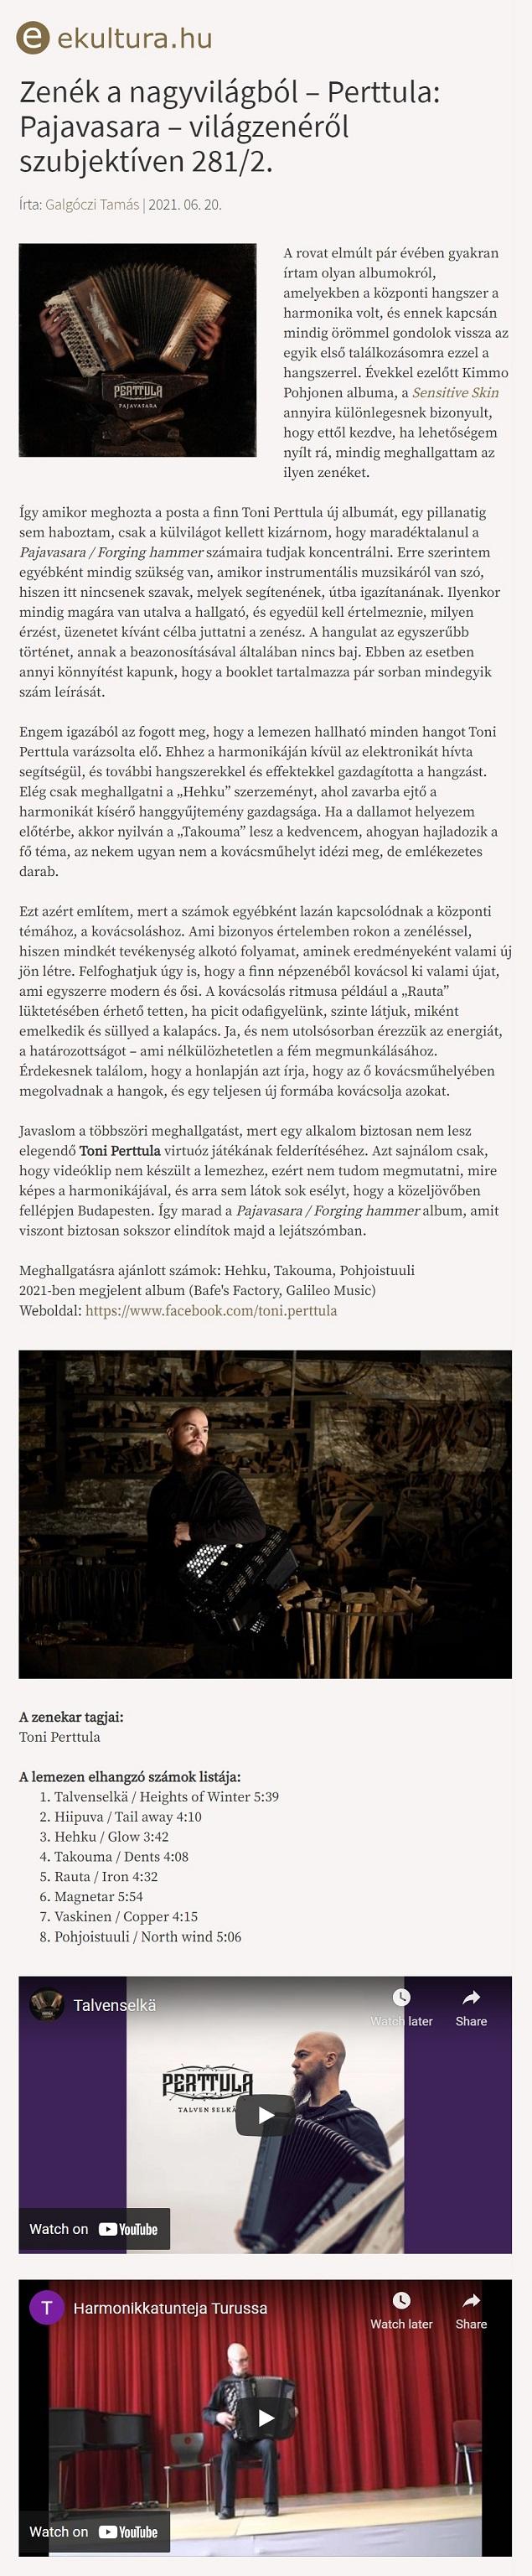 eKultura.hu (Hungary), 20.6.2021